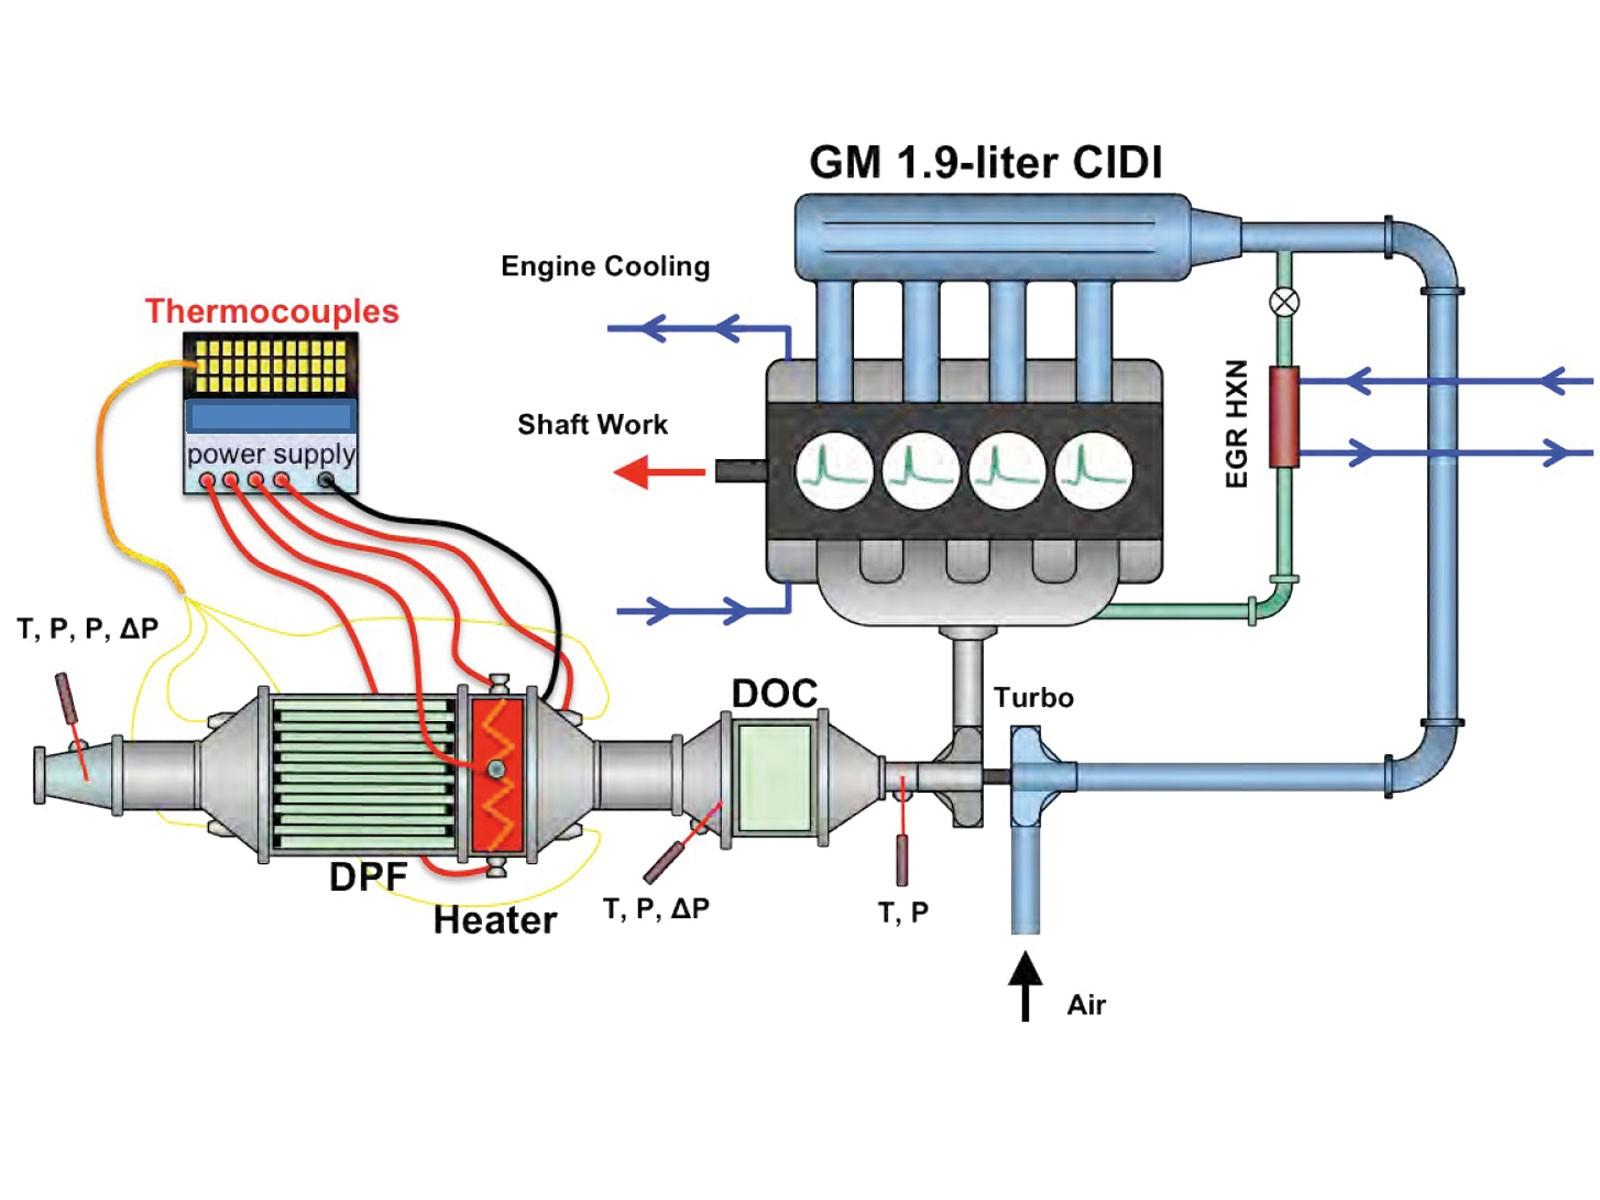 hight resolution of saturn v f1 engine diagram real spaceships engine diagram spaceship diagram drawing spaceship blueprints